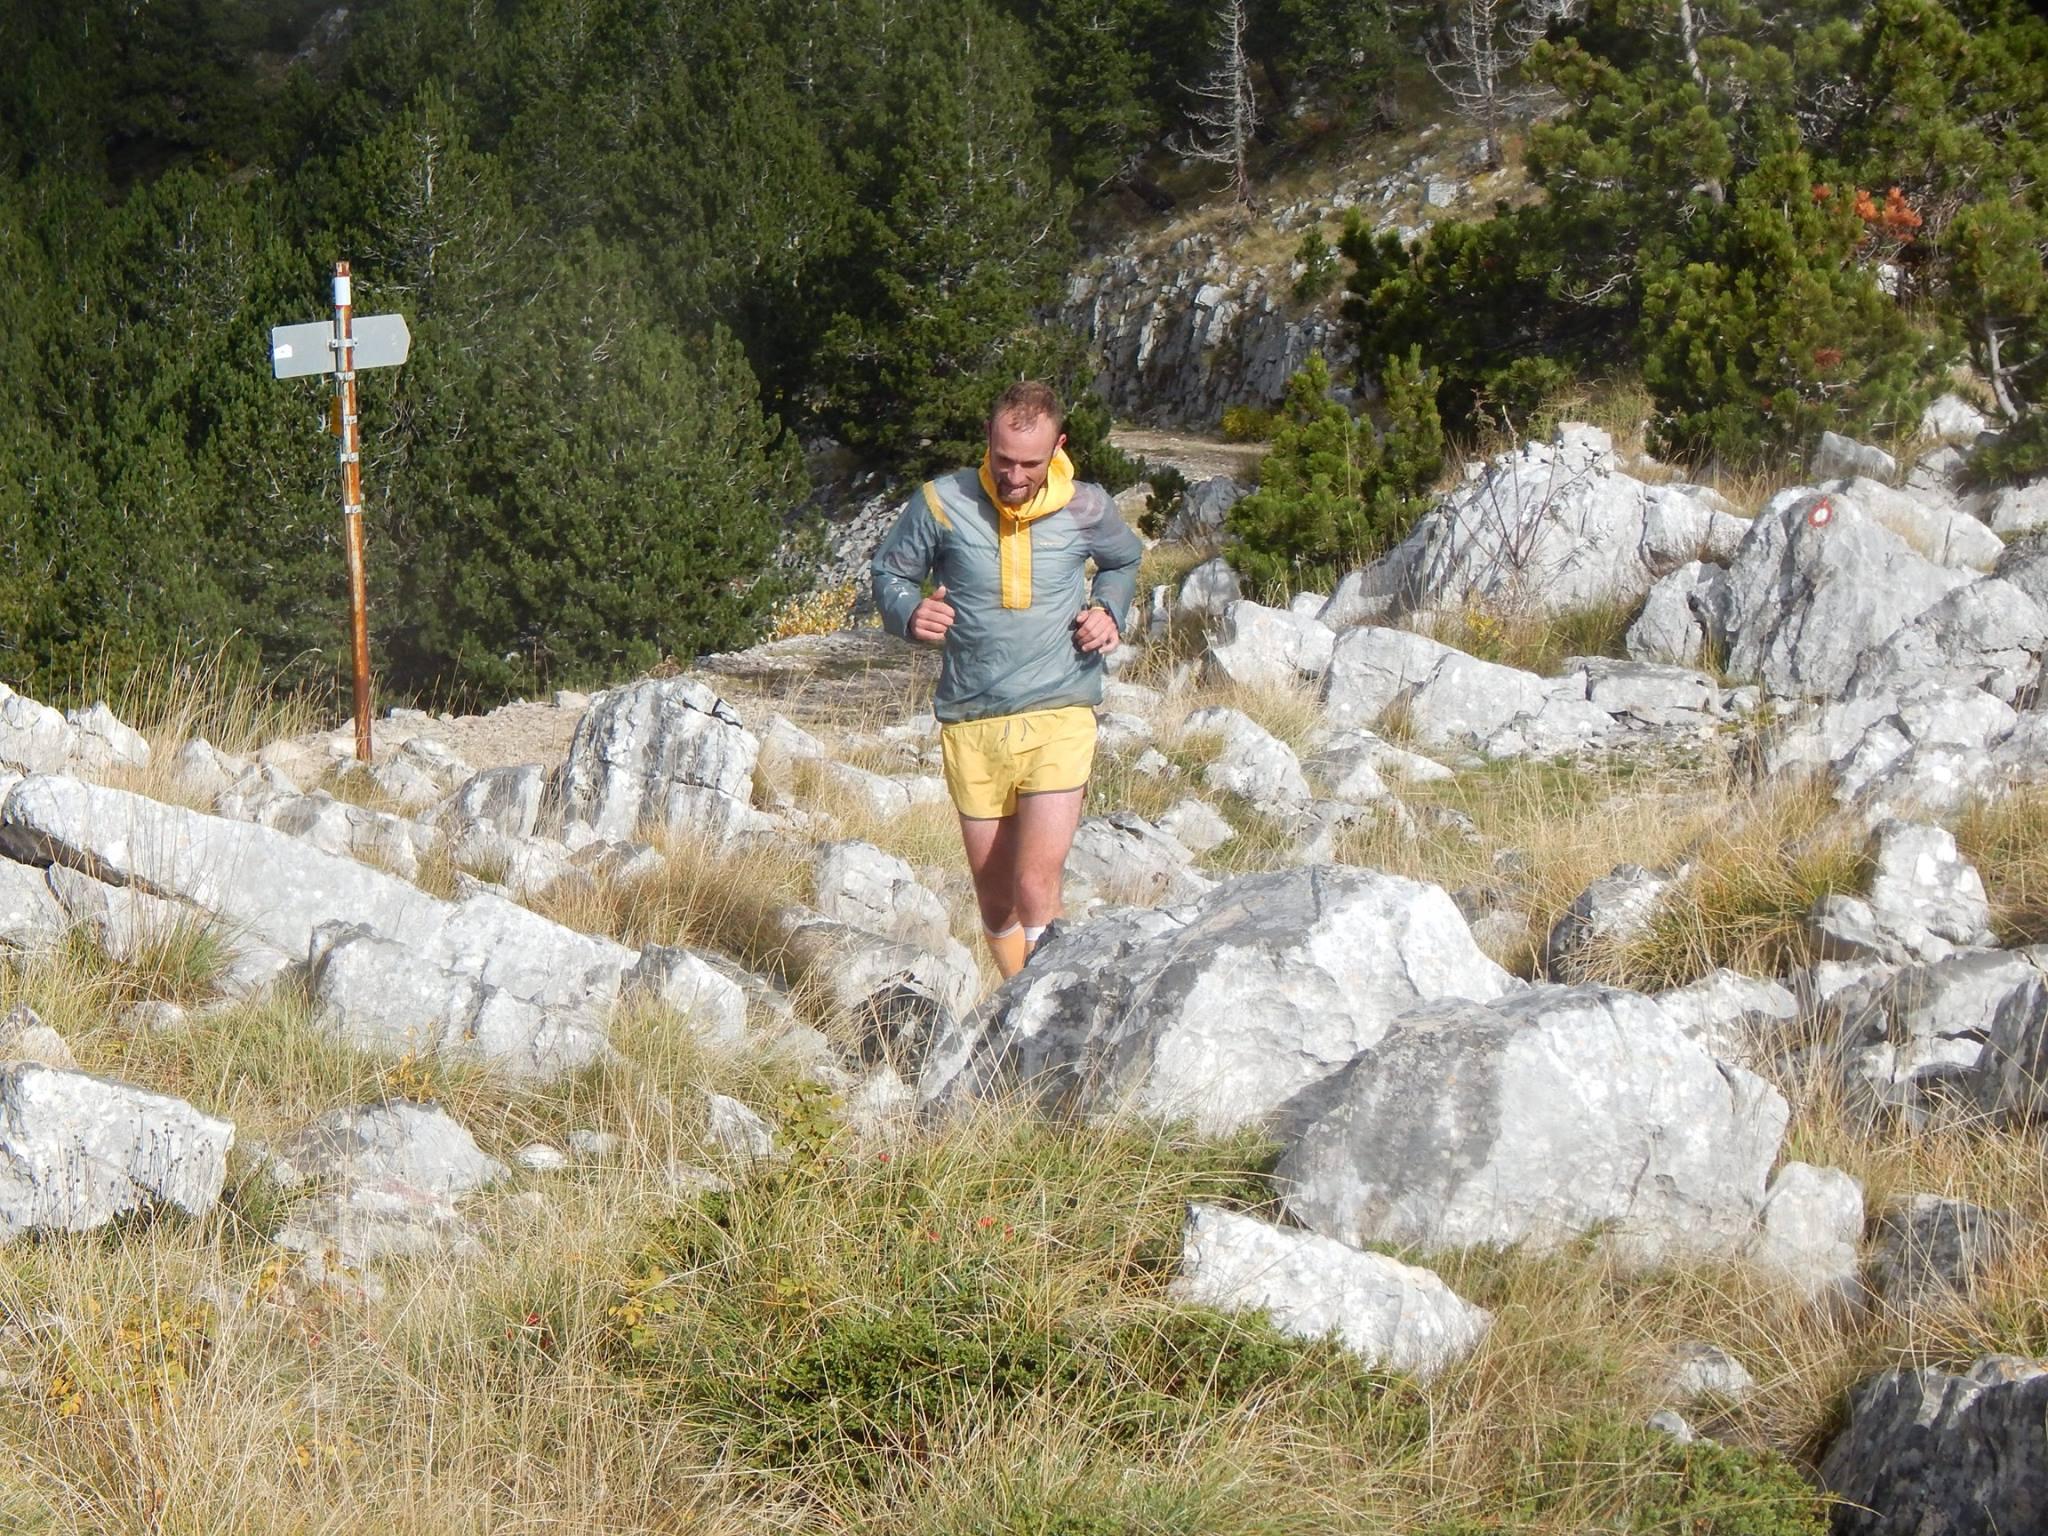 alpinist-dubrovnik-odubrovnik-go-dubrovnik-croatia (1)